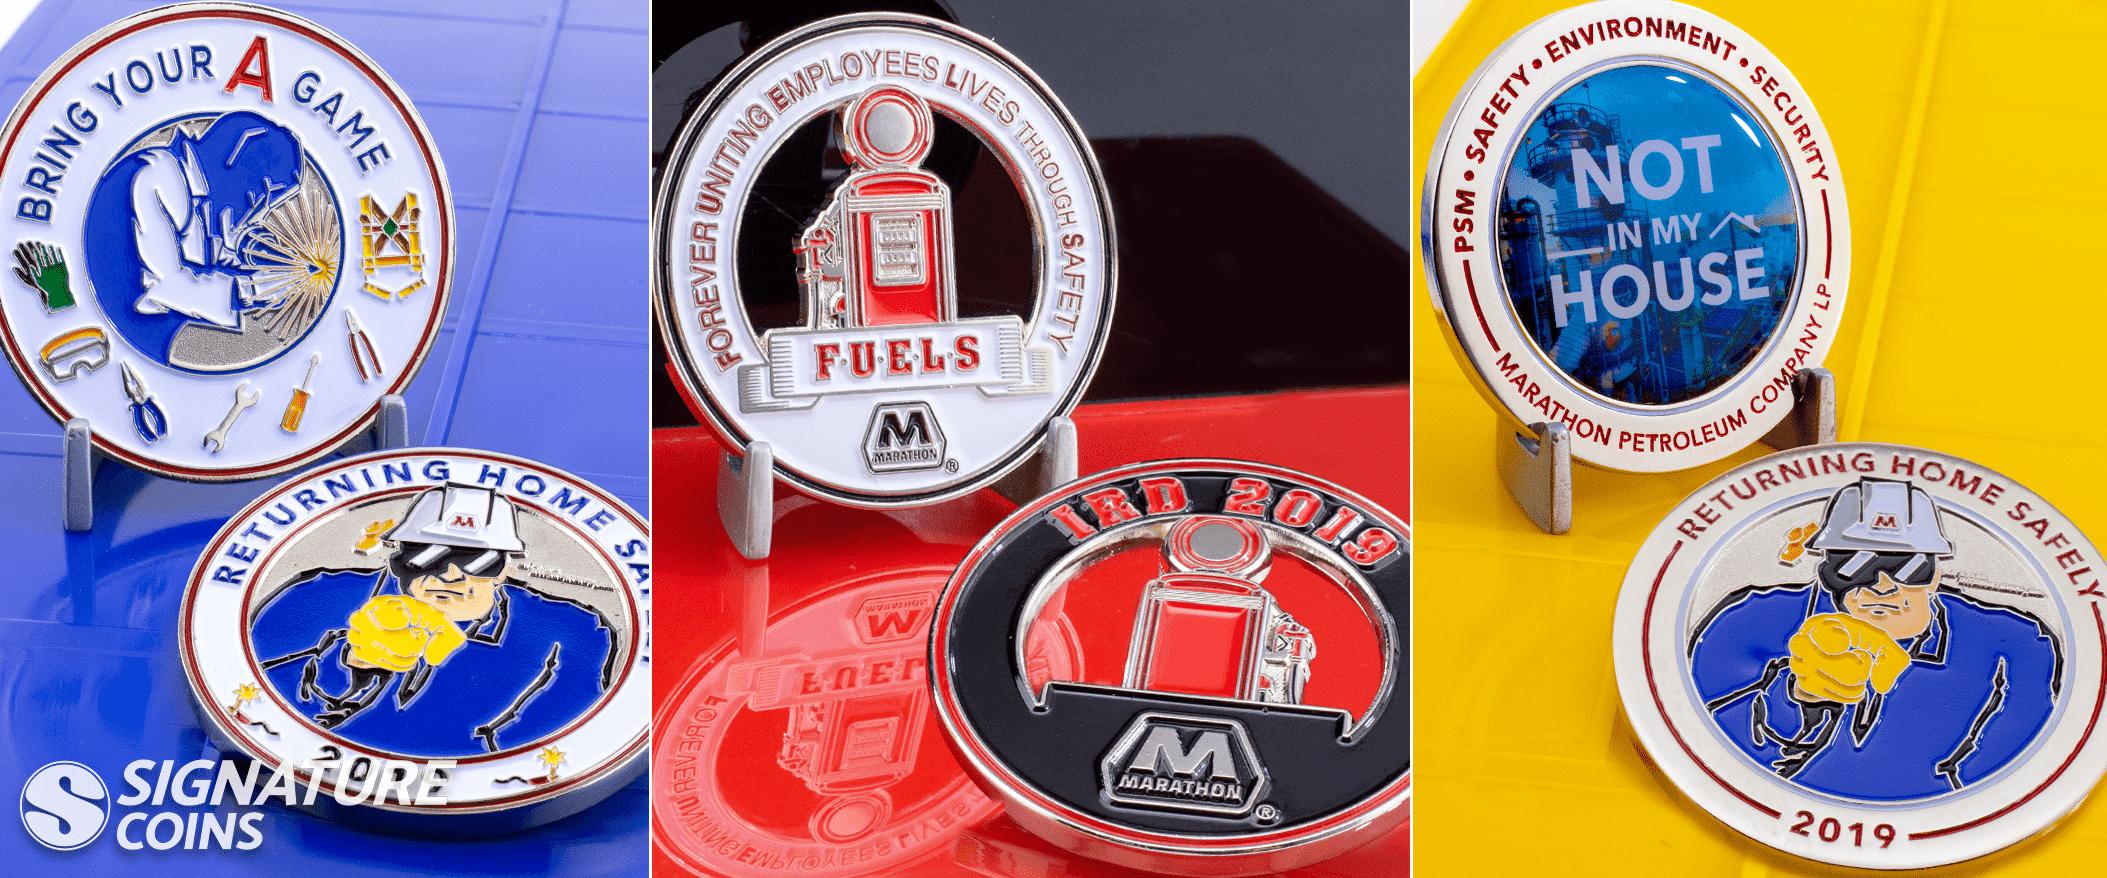 Safety Coins - Marathon - FUELS challenge coims by signature coins